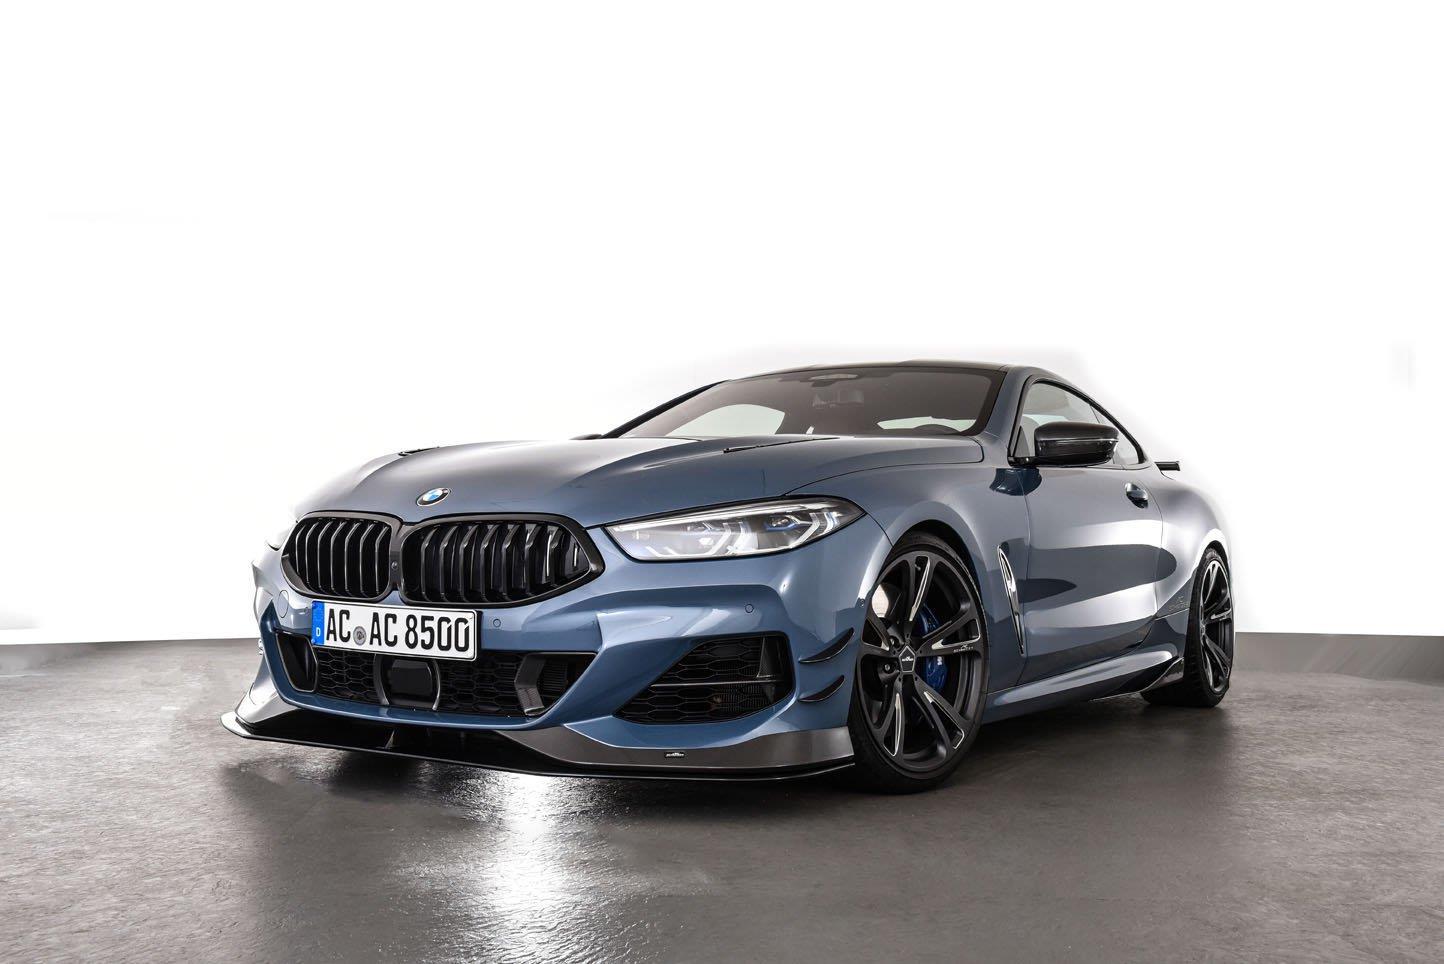 BMW 8-Series tang cong suat, 'lot xac' voi ban do moi hinh anh 9